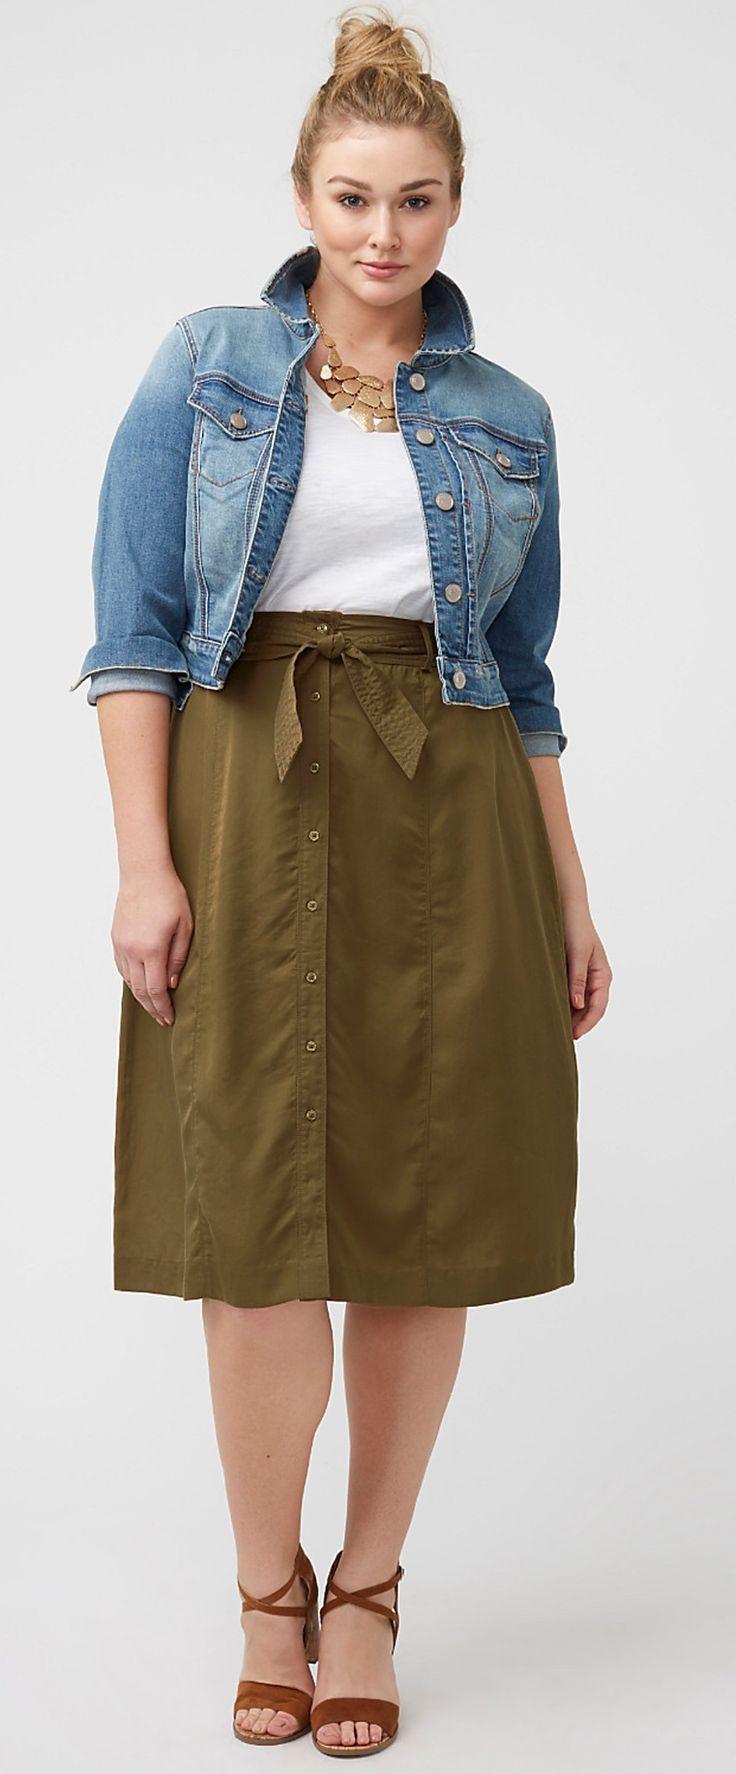 17 Best Ideas About Plus Size Casual On Pinterest Curve Weekend Dresses Women 39 S Plus Size